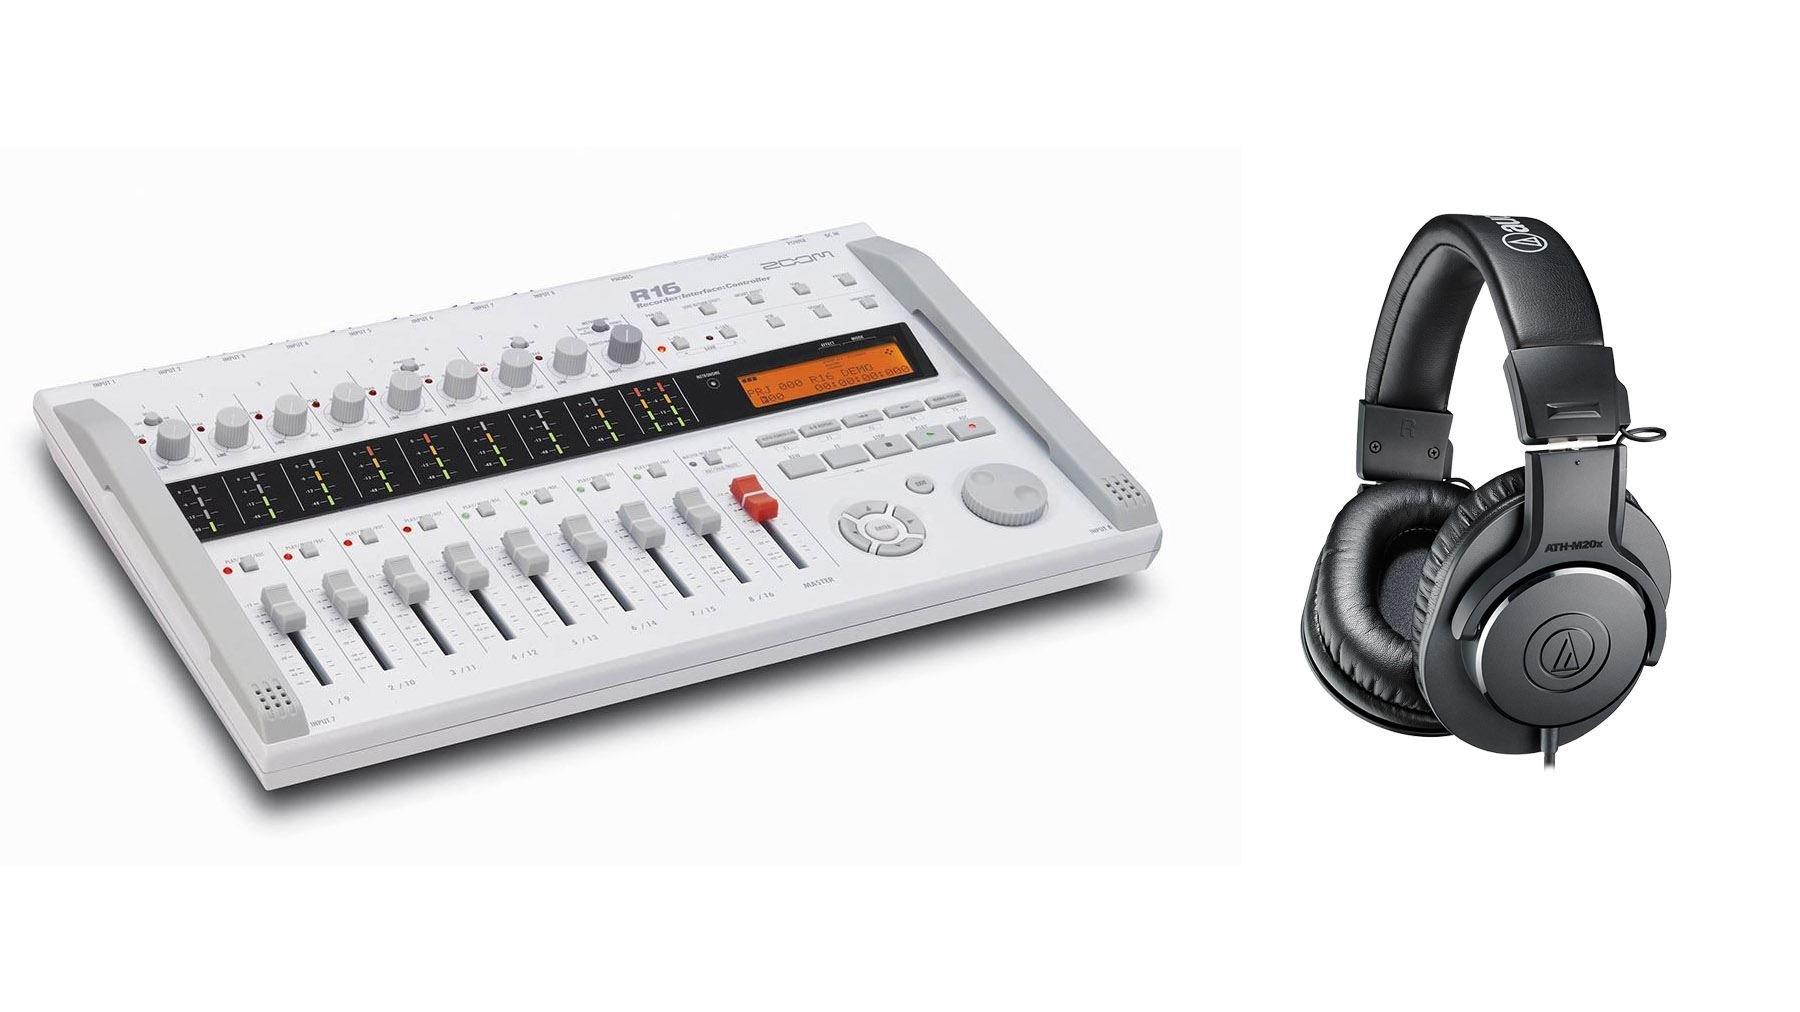 Zoom R16 w/ Audio-Technica ATH-M20x Headphones Bundle by Zoom (Image #1)